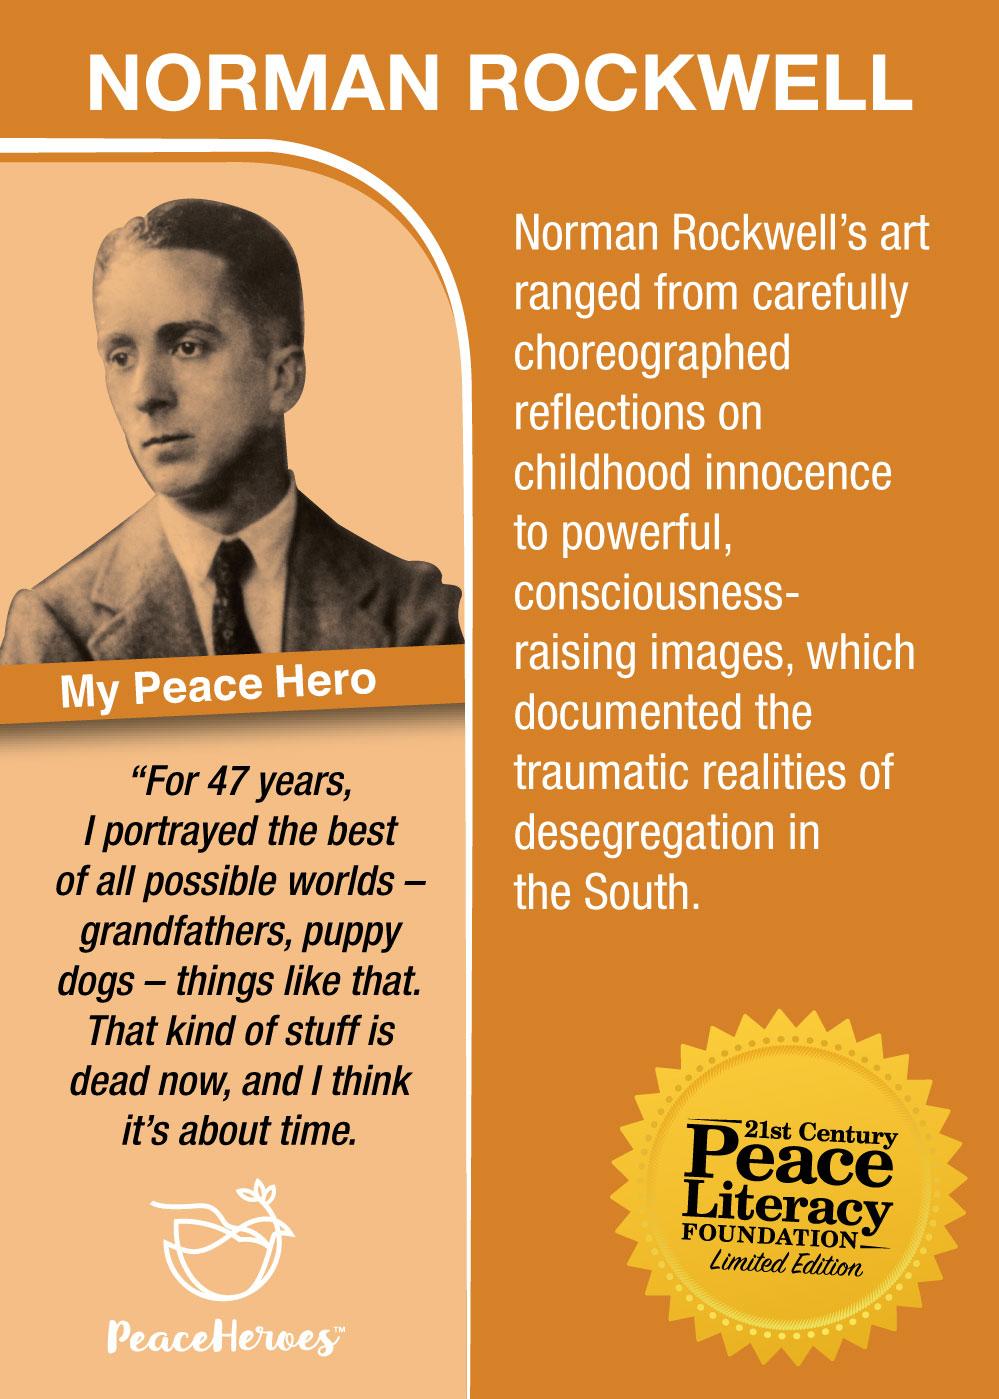 RockwellNorman.jpg